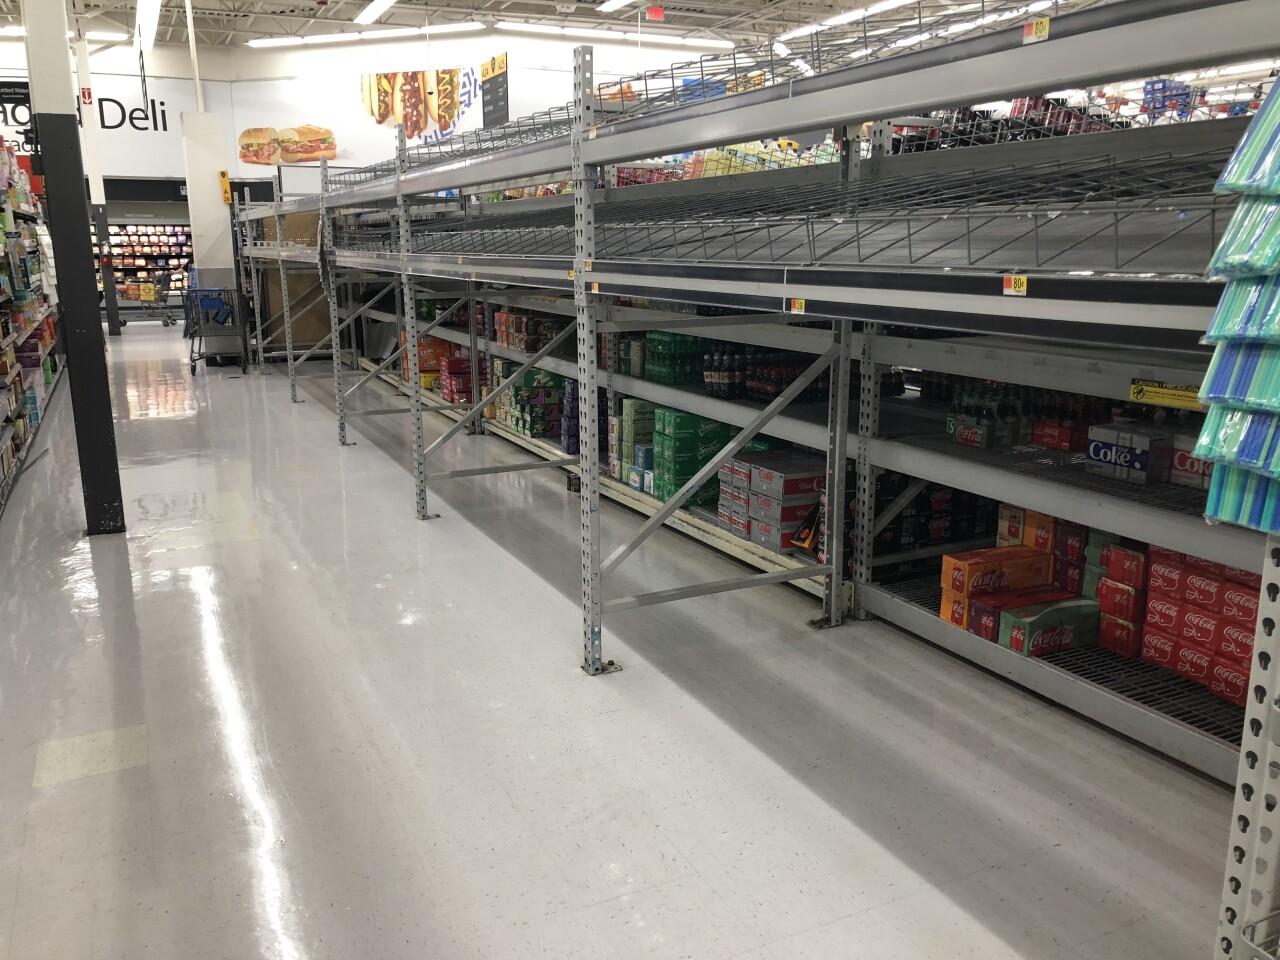 Walmart empty shelves